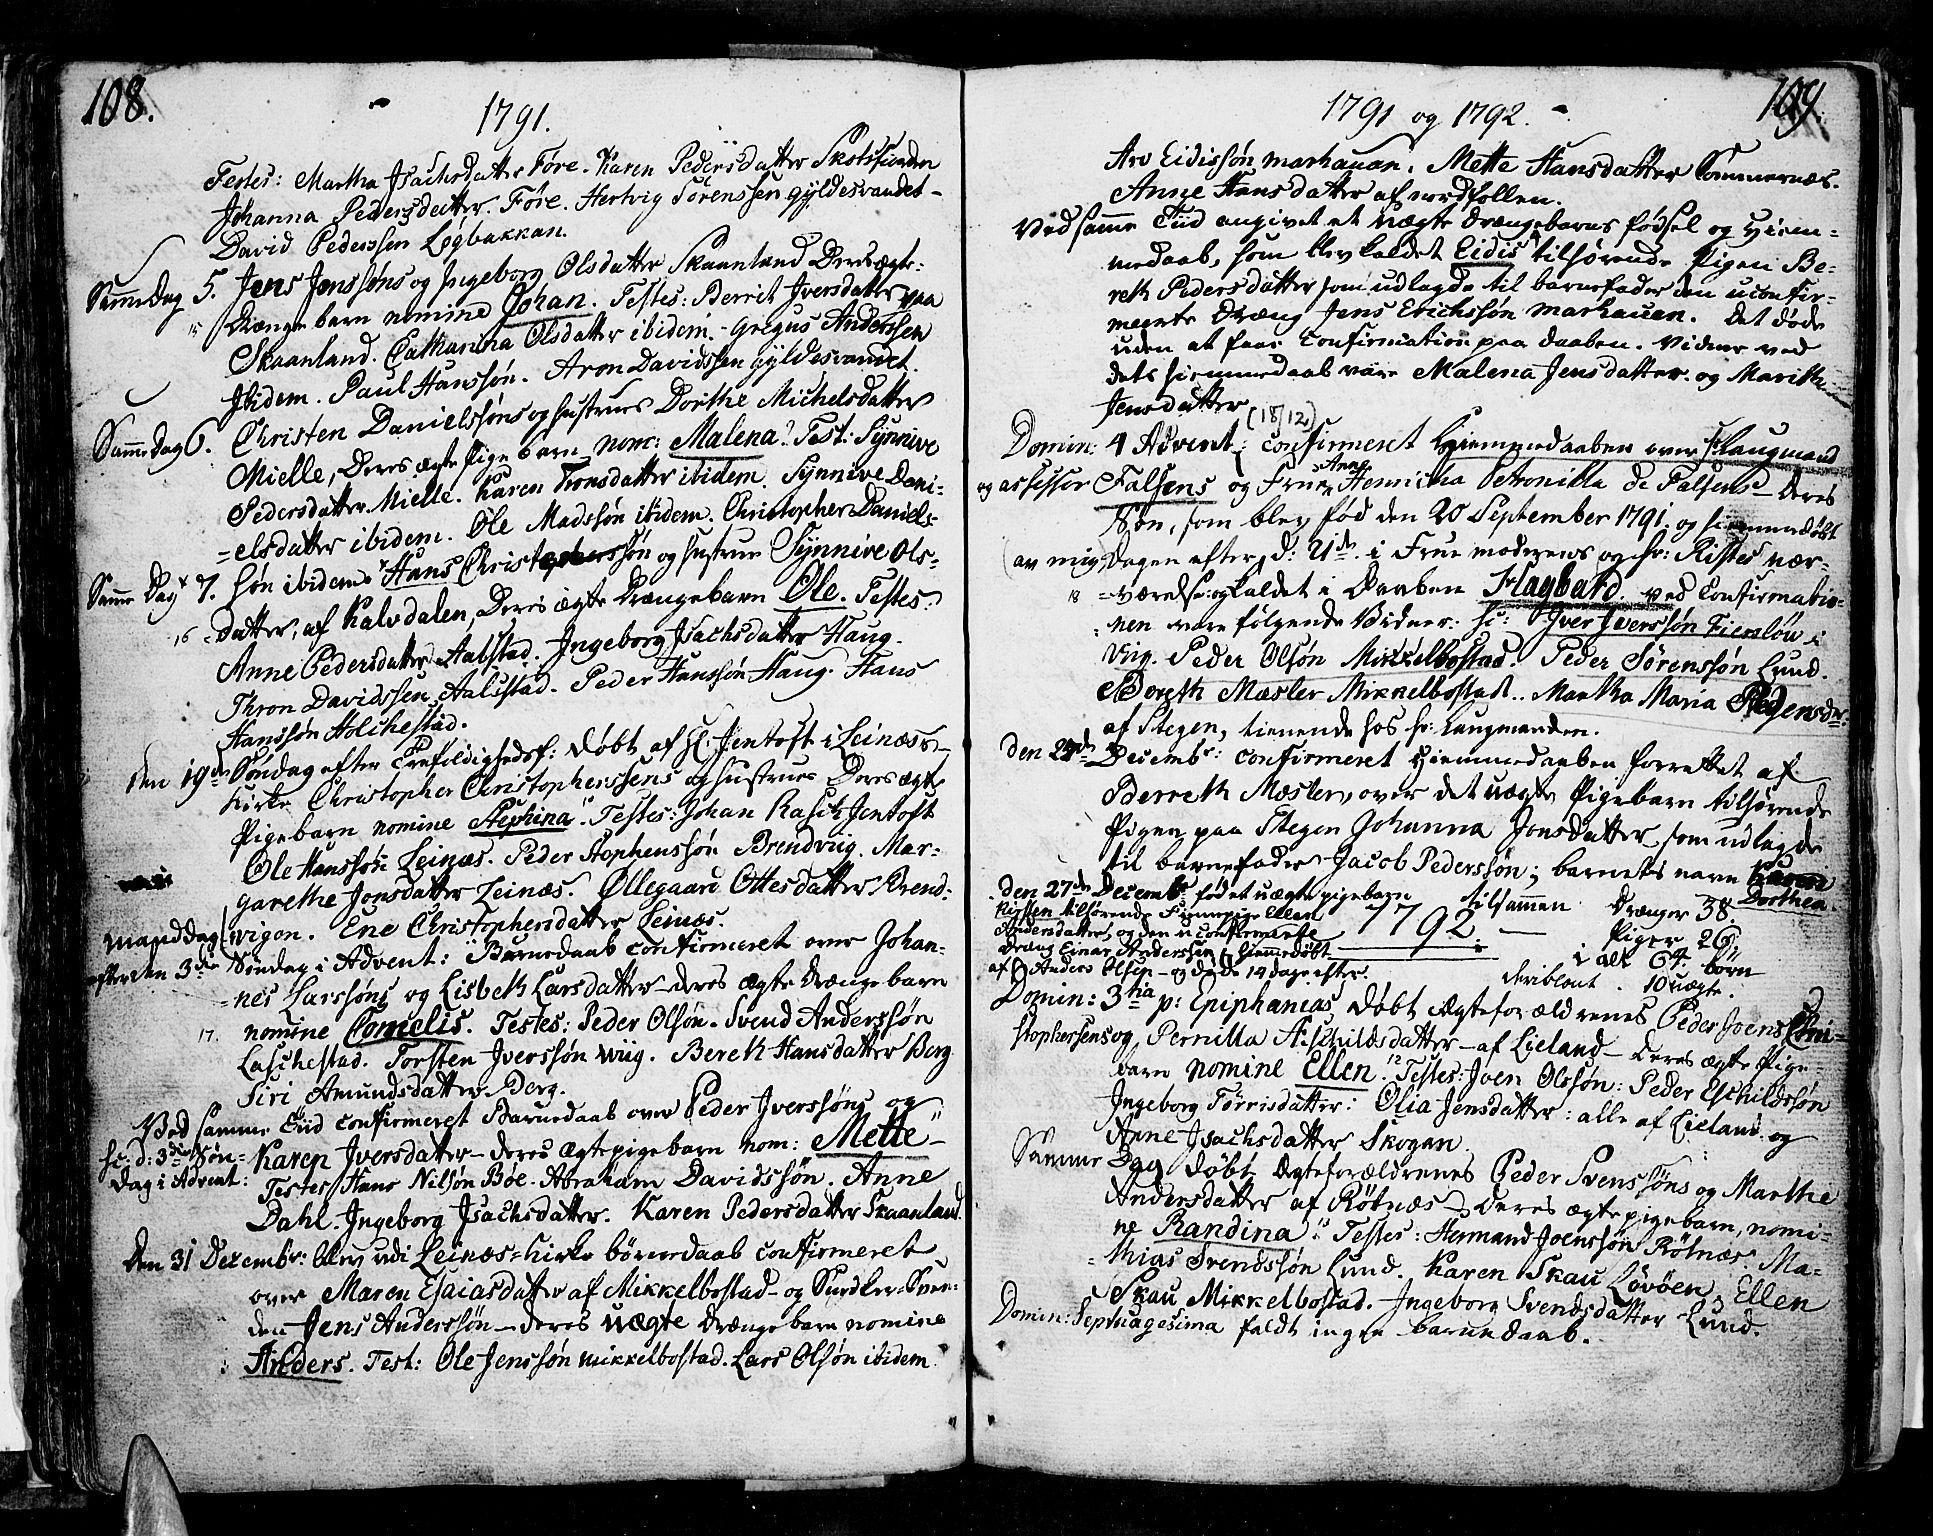 SAT, Ministerialprotokoller, klokkerbøker og fødselsregistre - Nordland, 855/L0796: Ministerialbok nr. 855A04, 1776-1813, s. 108-109